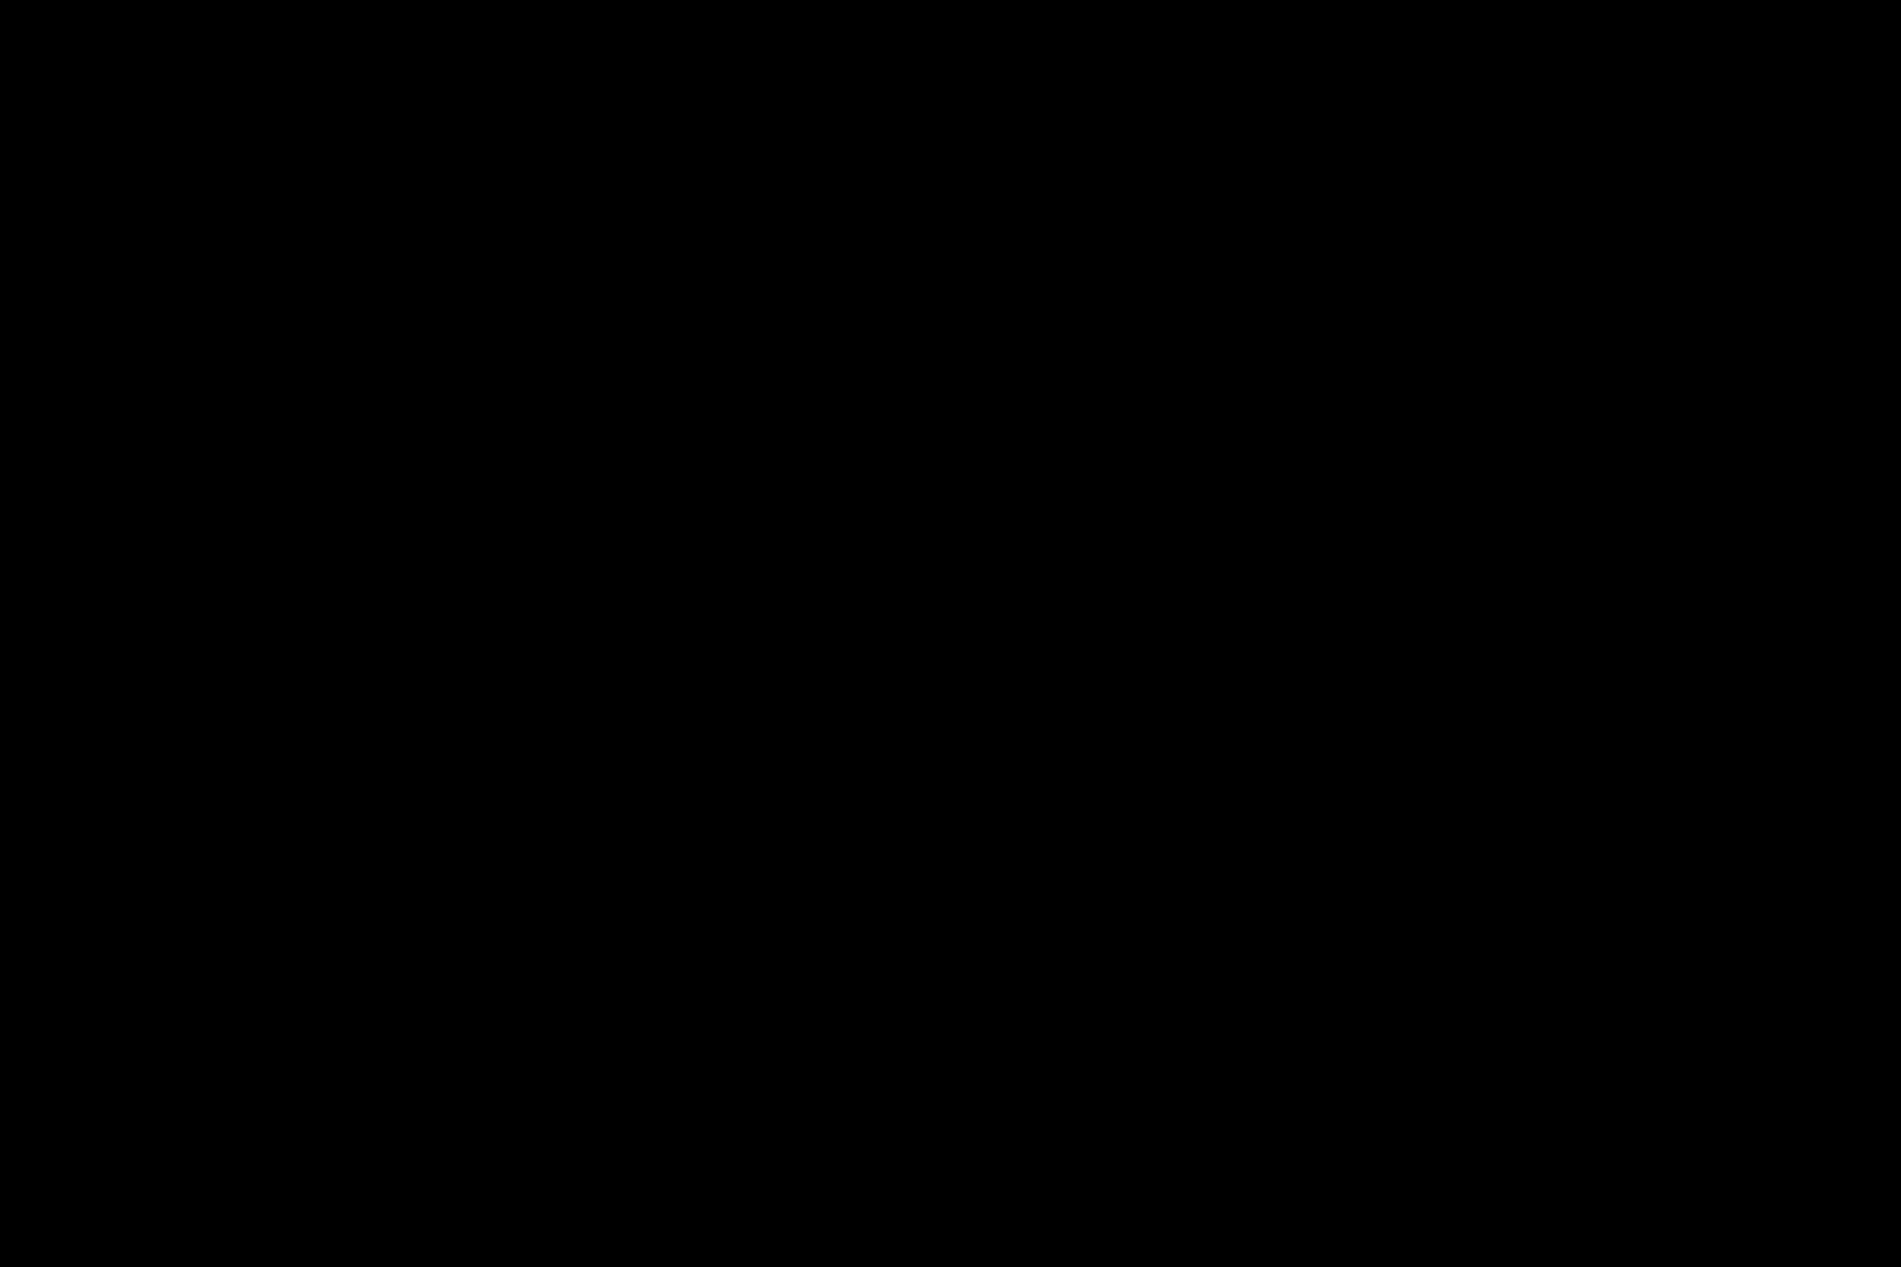 tableau sangles aériennes synchronisées des farfadais